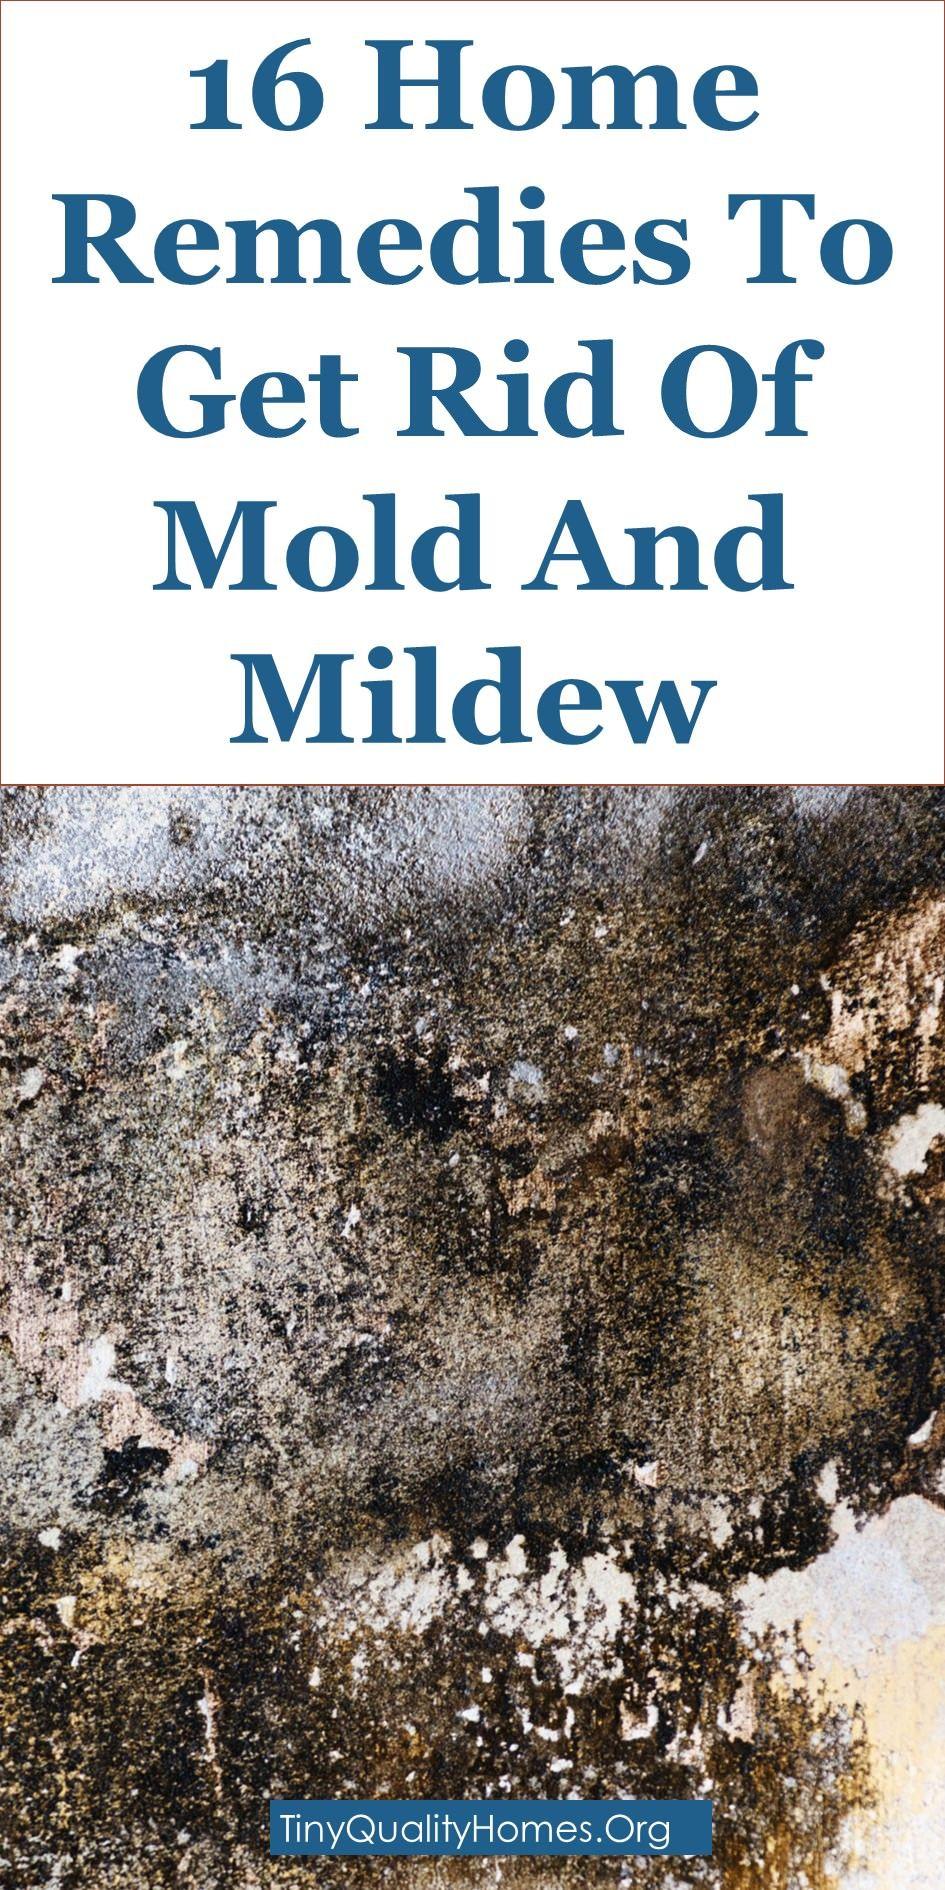 d3ef34790879d5025eae0d3078bafda9 - How To Get Rid Of The Mold In The House